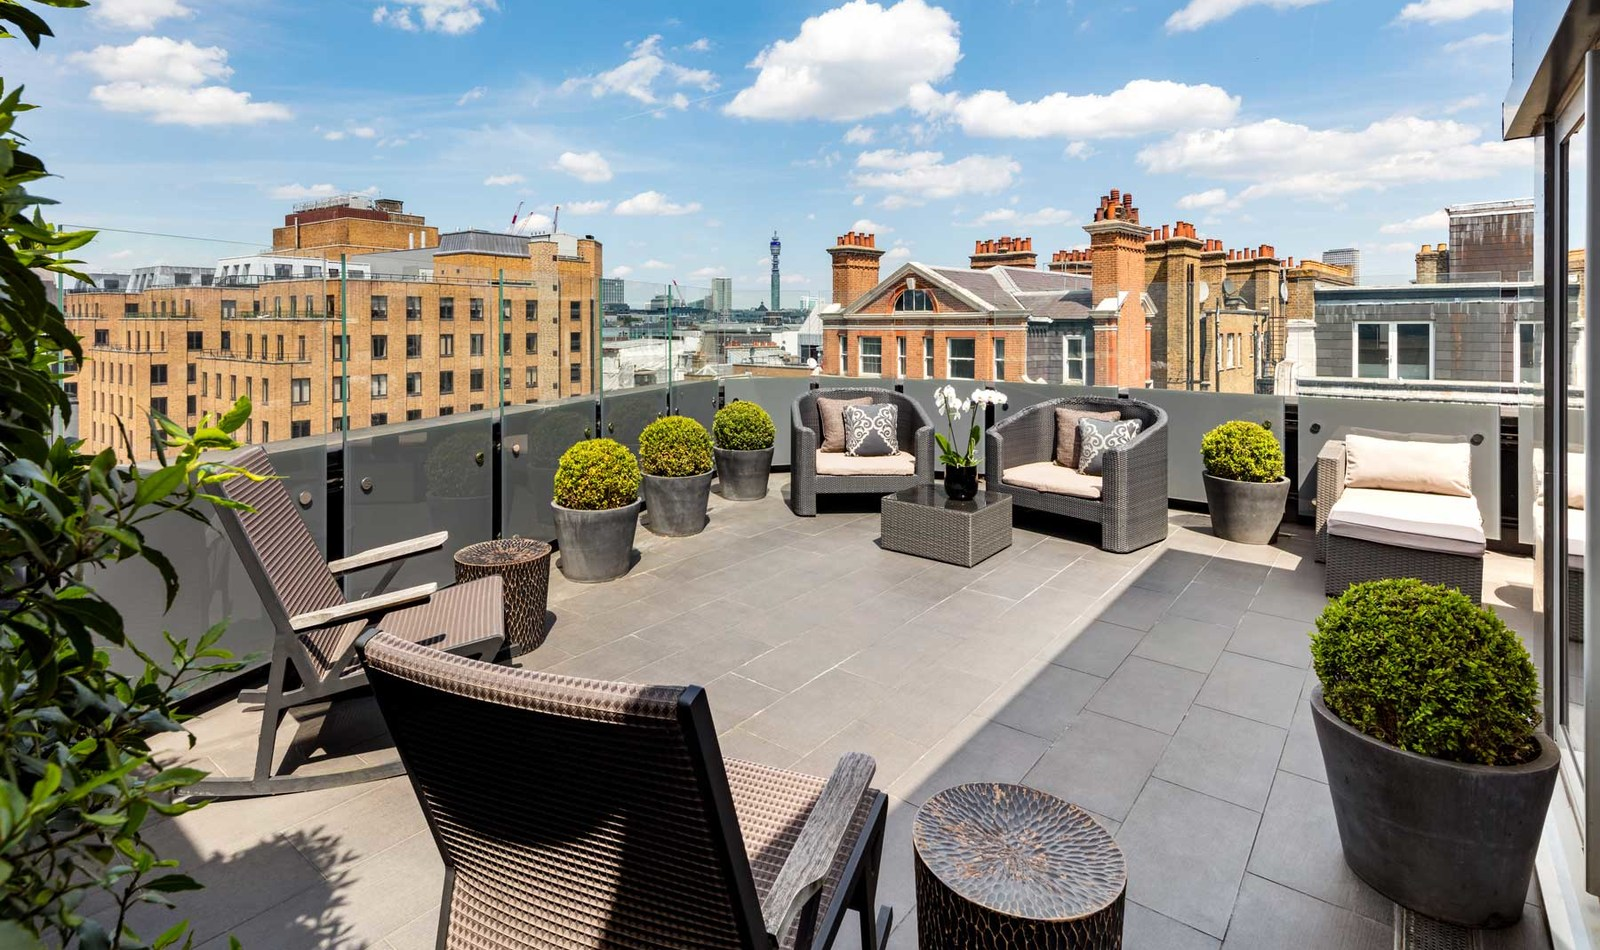 Rundreise - May-Fair-Bedroom-Suite-Ebony-terrace_1600px-wide.jpg